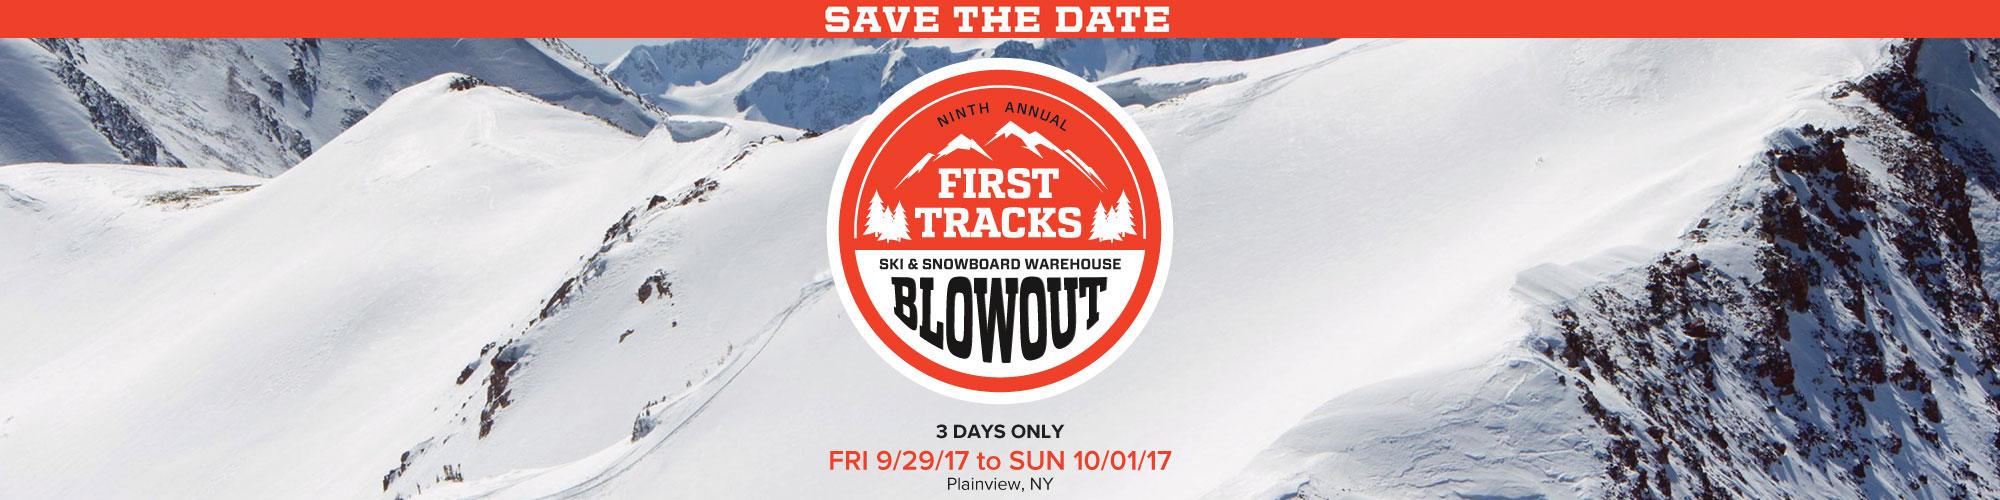 First Tracks Ski and Snowboard Warehouse Blowout - Sun \u0026 Ski